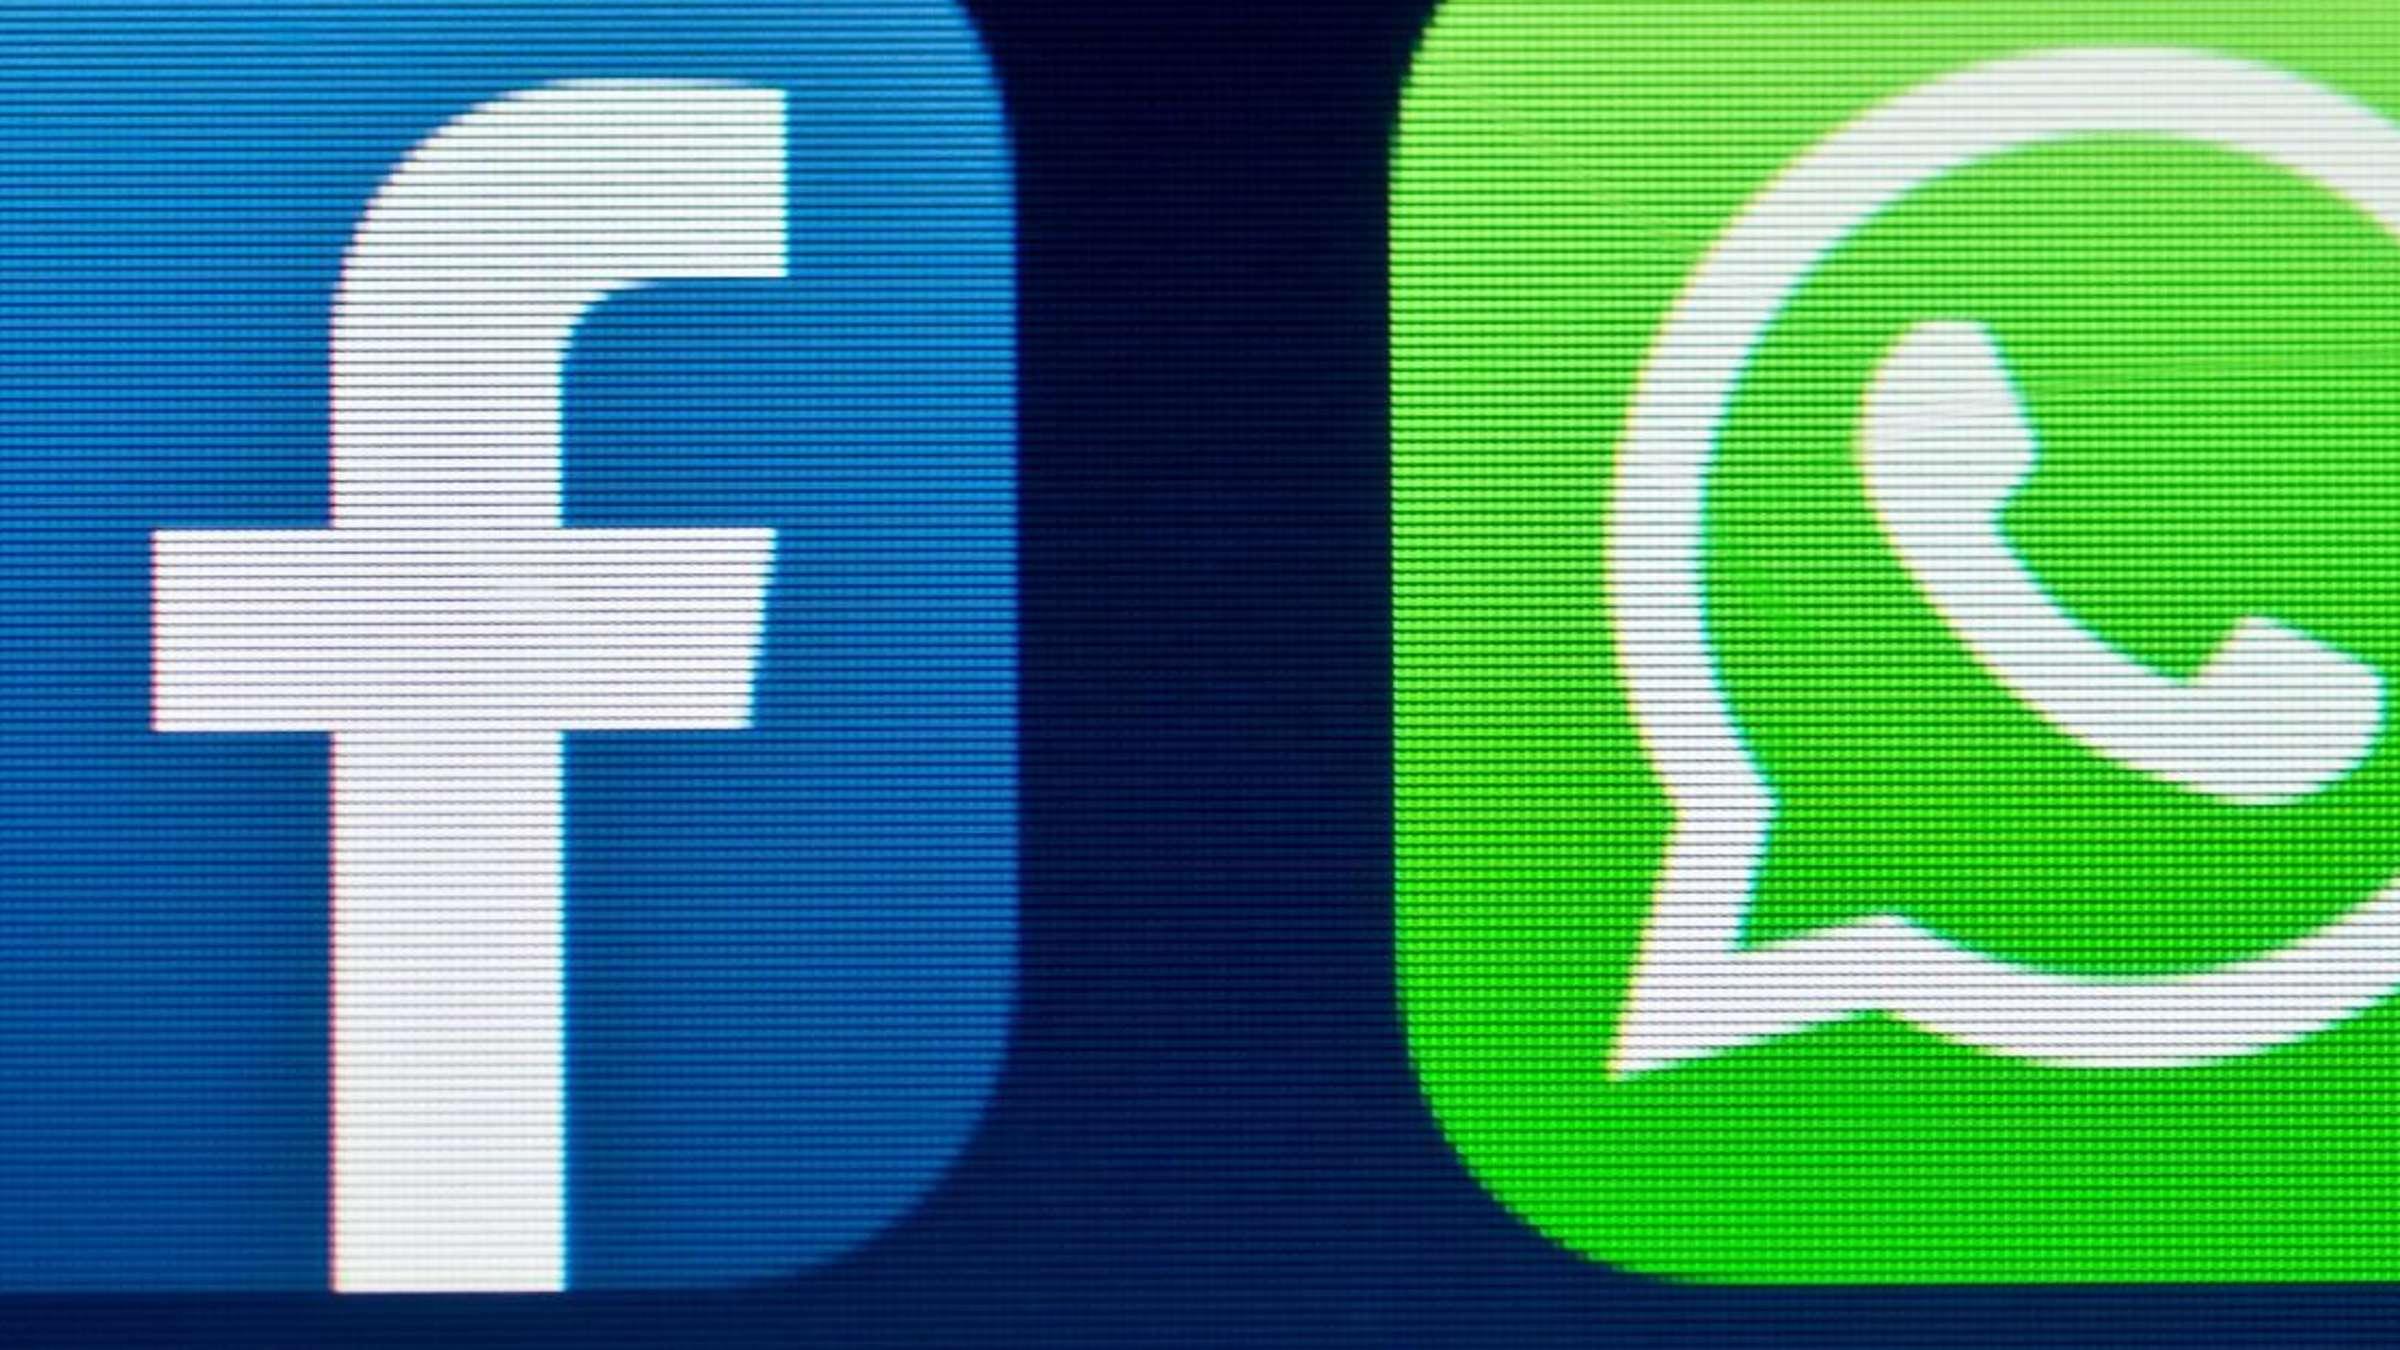 Facebook profil sehen ohne freundschaft